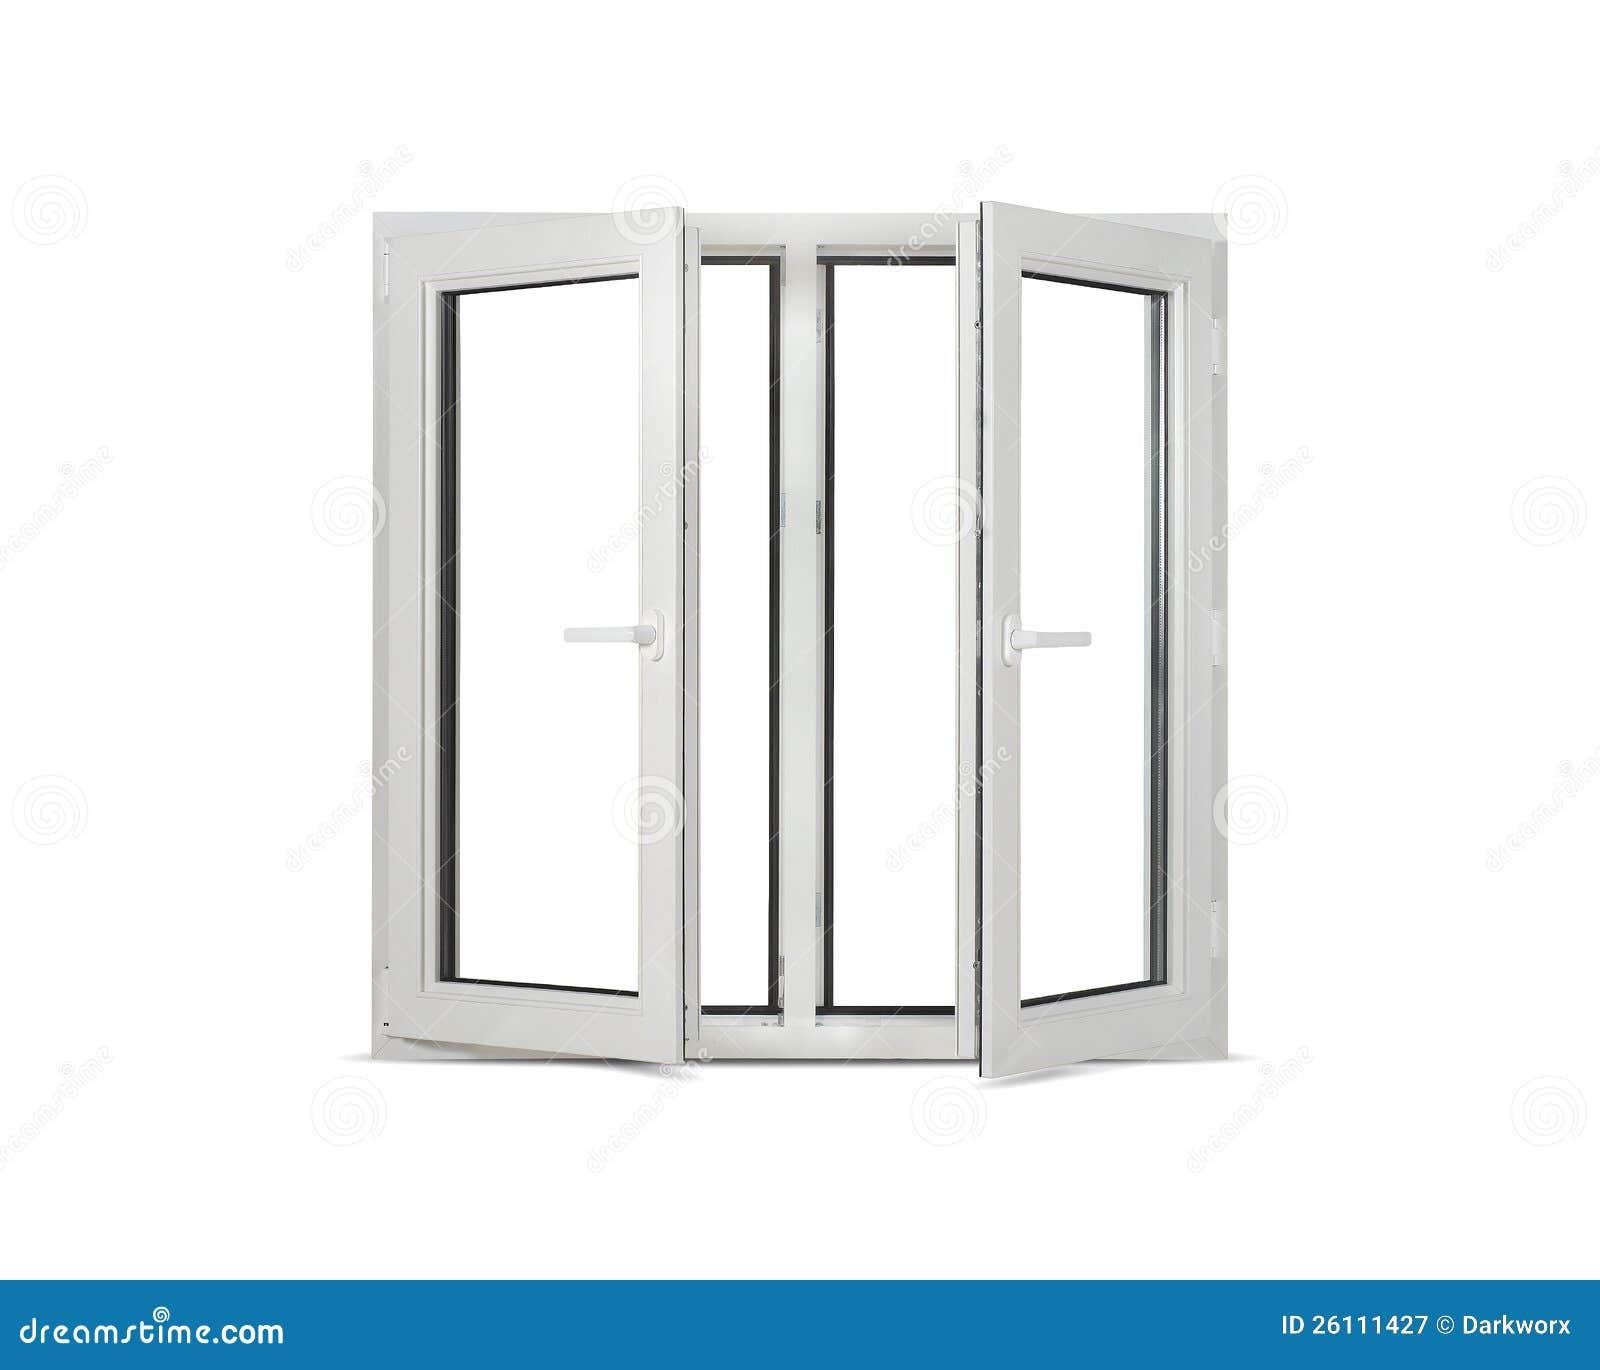 Plastic Pvc Window On White Blank Background Royalty Free